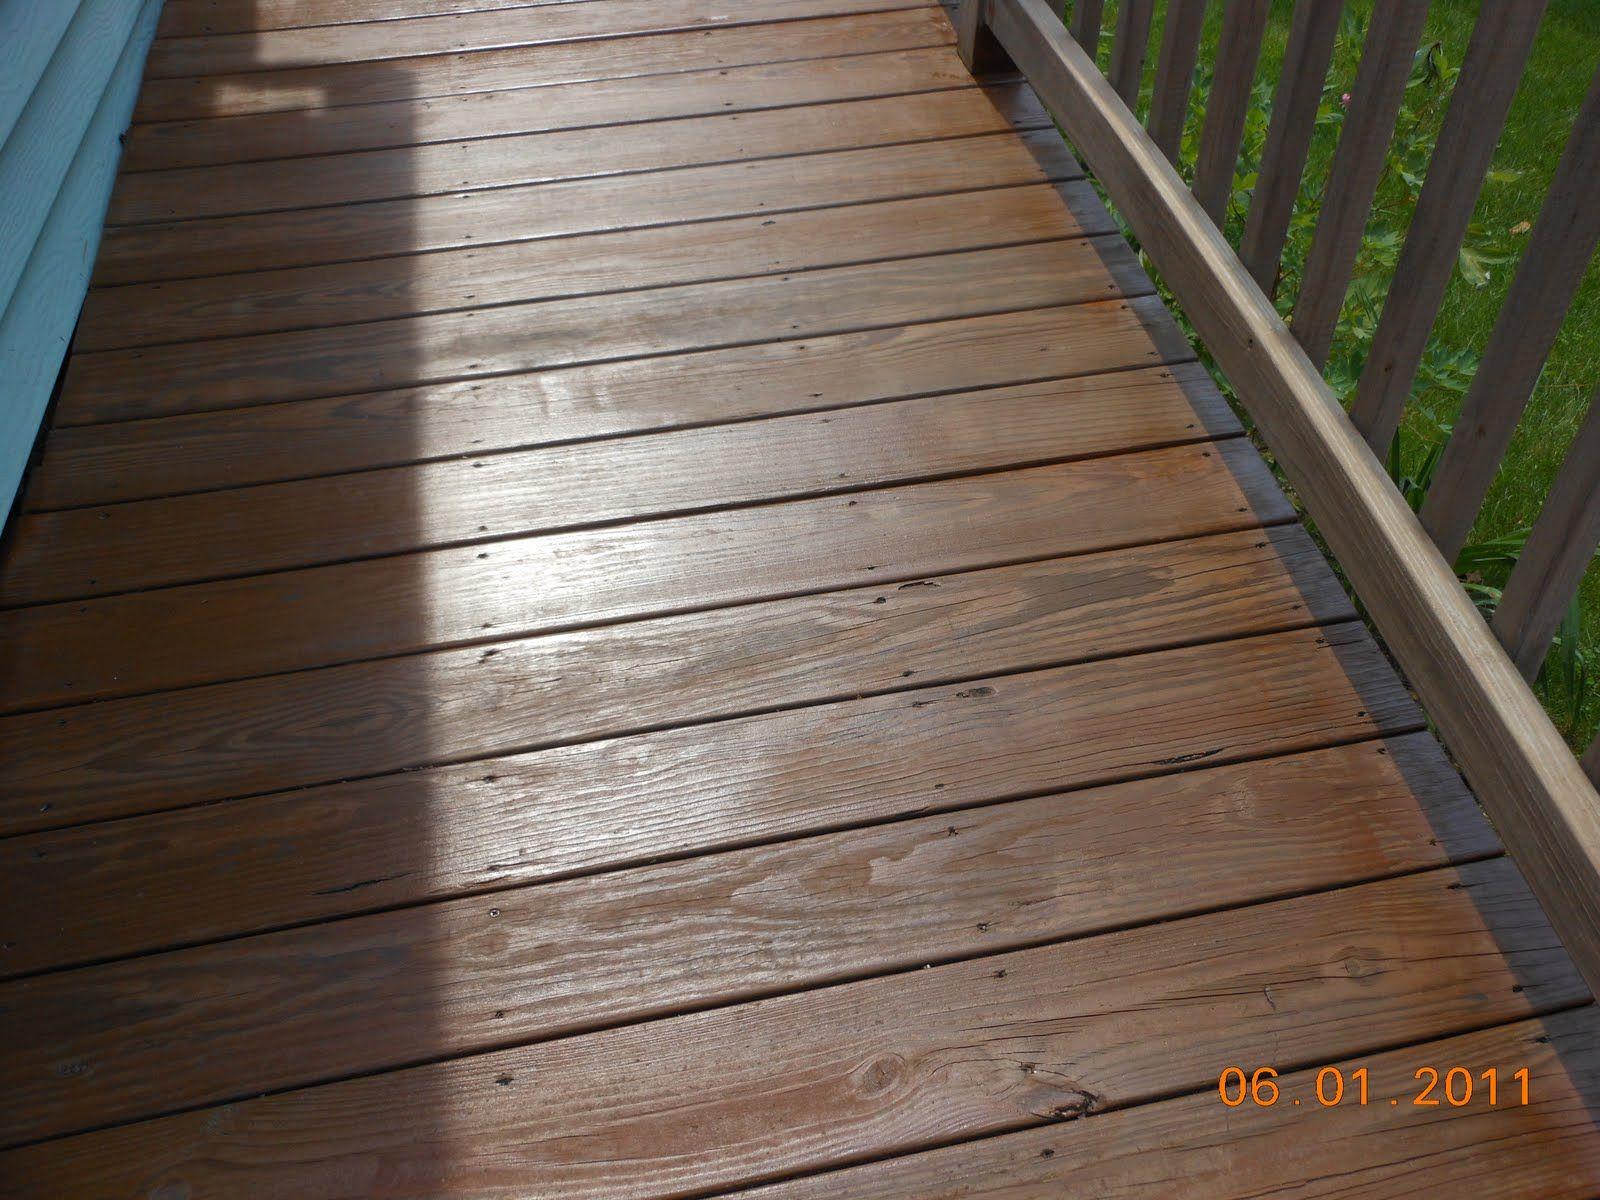 Cabot Semi Solid Bark Mulch Staining Deck Decks Backyard Deck